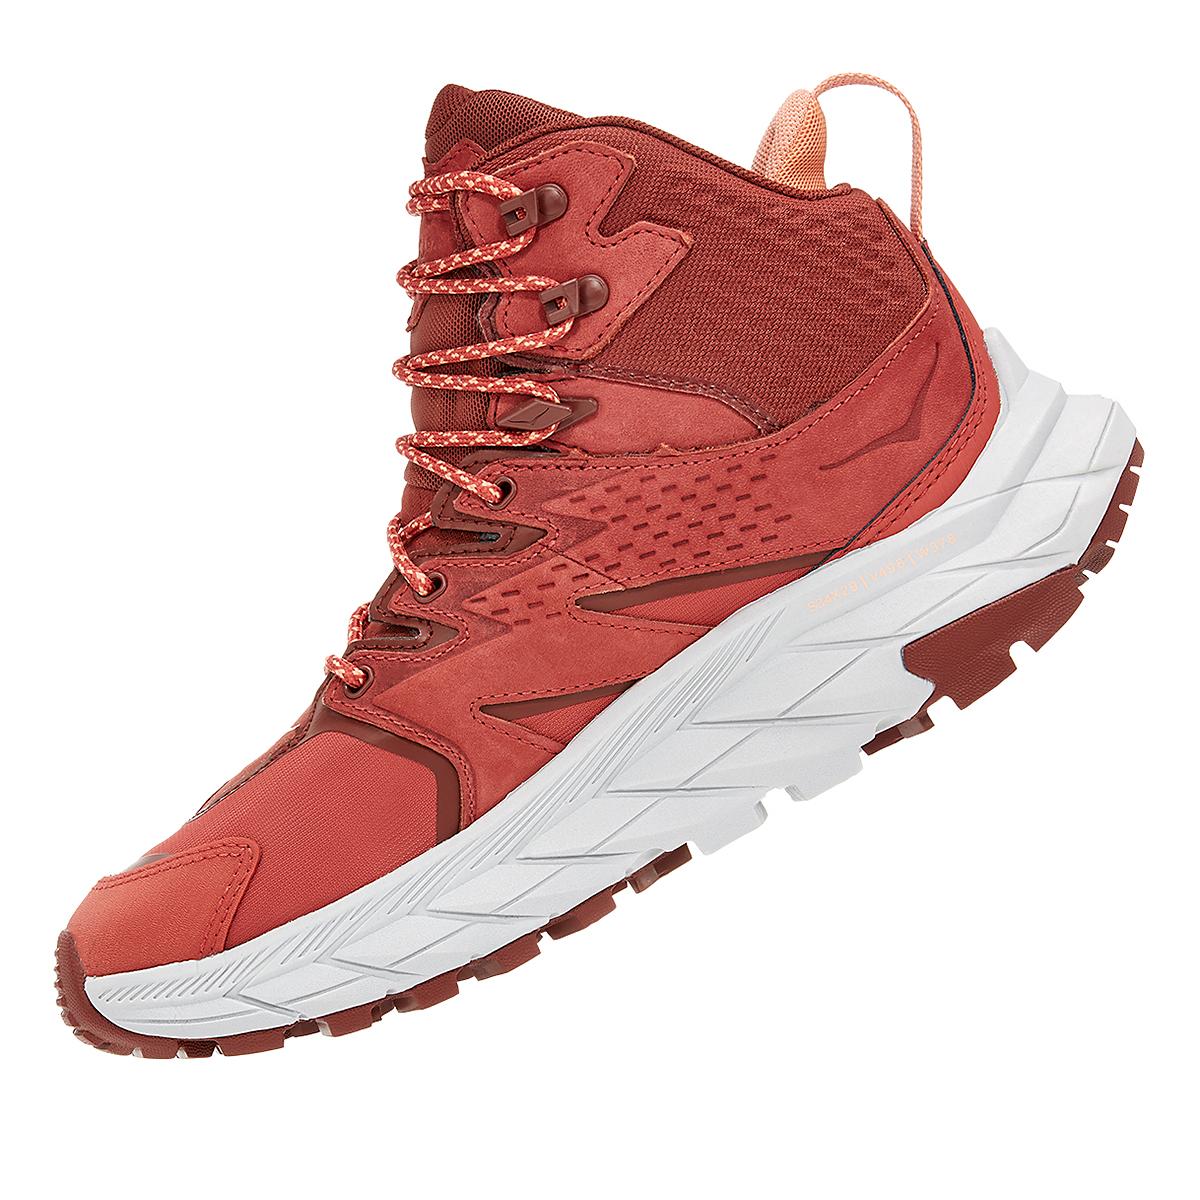 Women's Hoka One One Anacapa Mid Gore-Tex Trail Running Shoe - Color: Hot Sauce/Cherry Mahogany - Size: 5 - Width: Regular, Hot Sauce/Cherry Mahogany, large, image 4